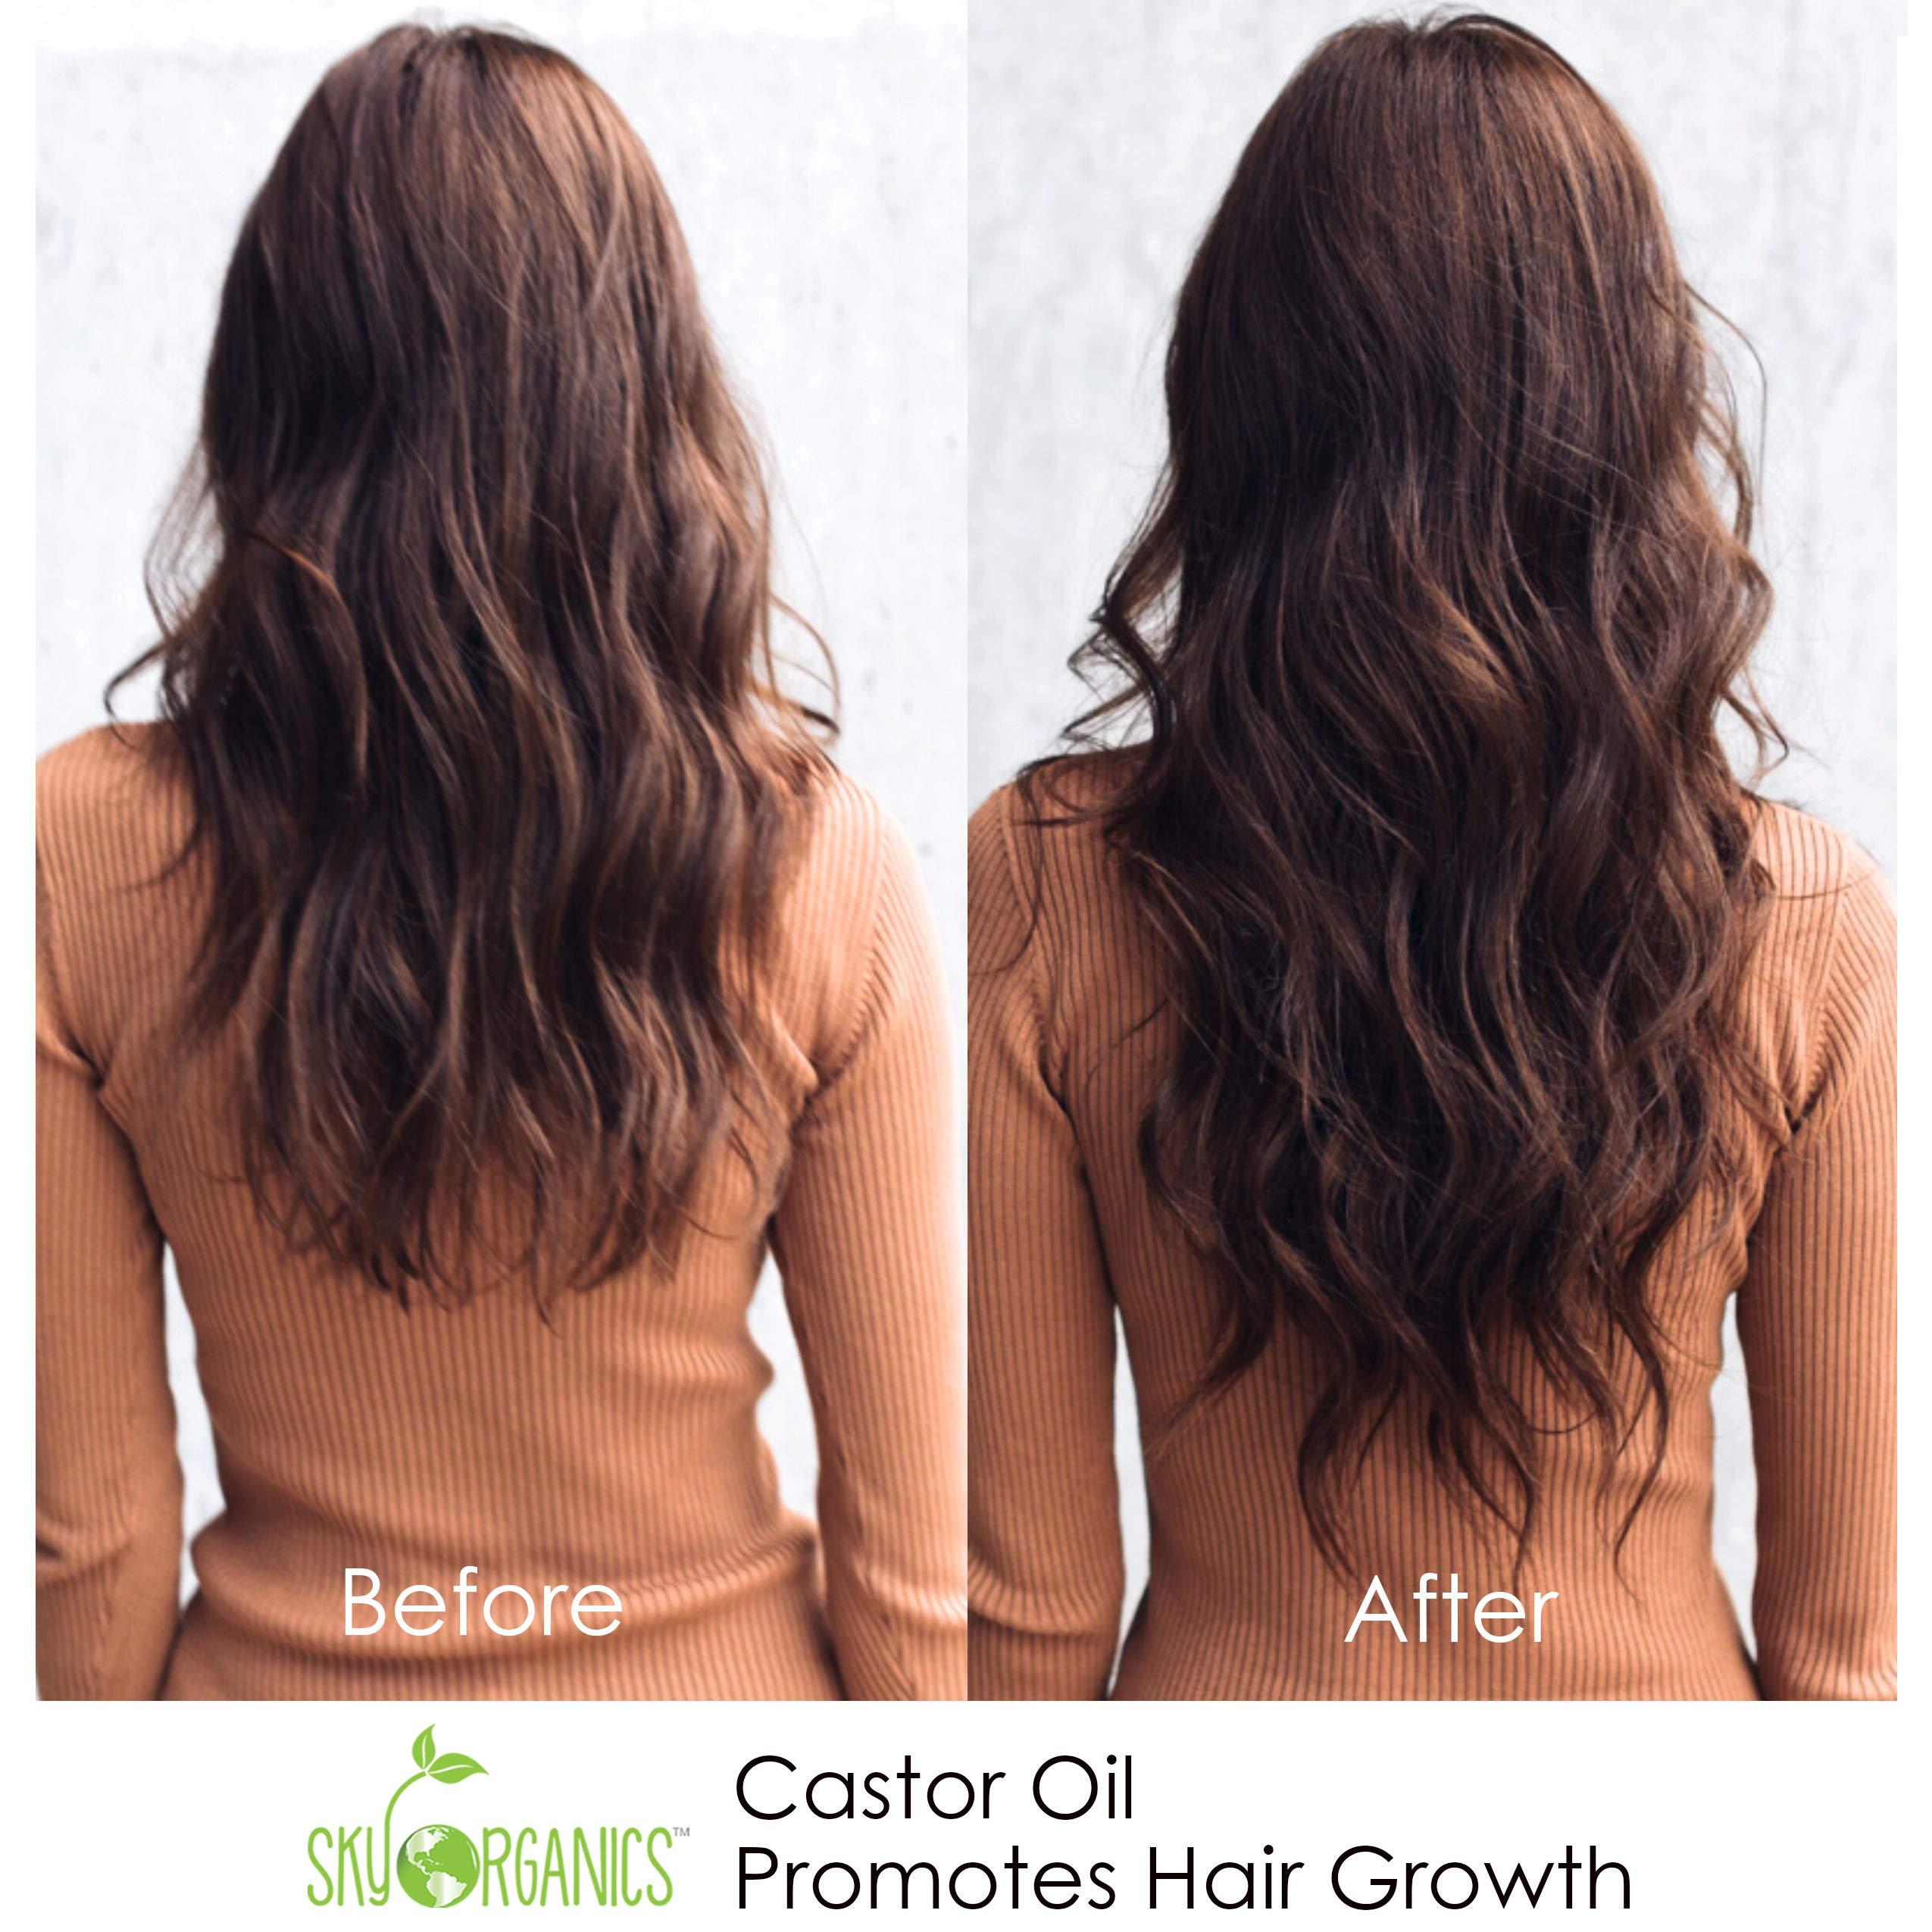 Castor Oil (16oz) USDA Organic Cold-Pressed, 100% Pure, Hexane-Free Castor Oil - Moisturizing & Healing, For Dry Skin, Hair Growth - For Skin, Hair Care, Eyelashes - Caster Oil By Sky Organics by Sky Organics (Image #9)